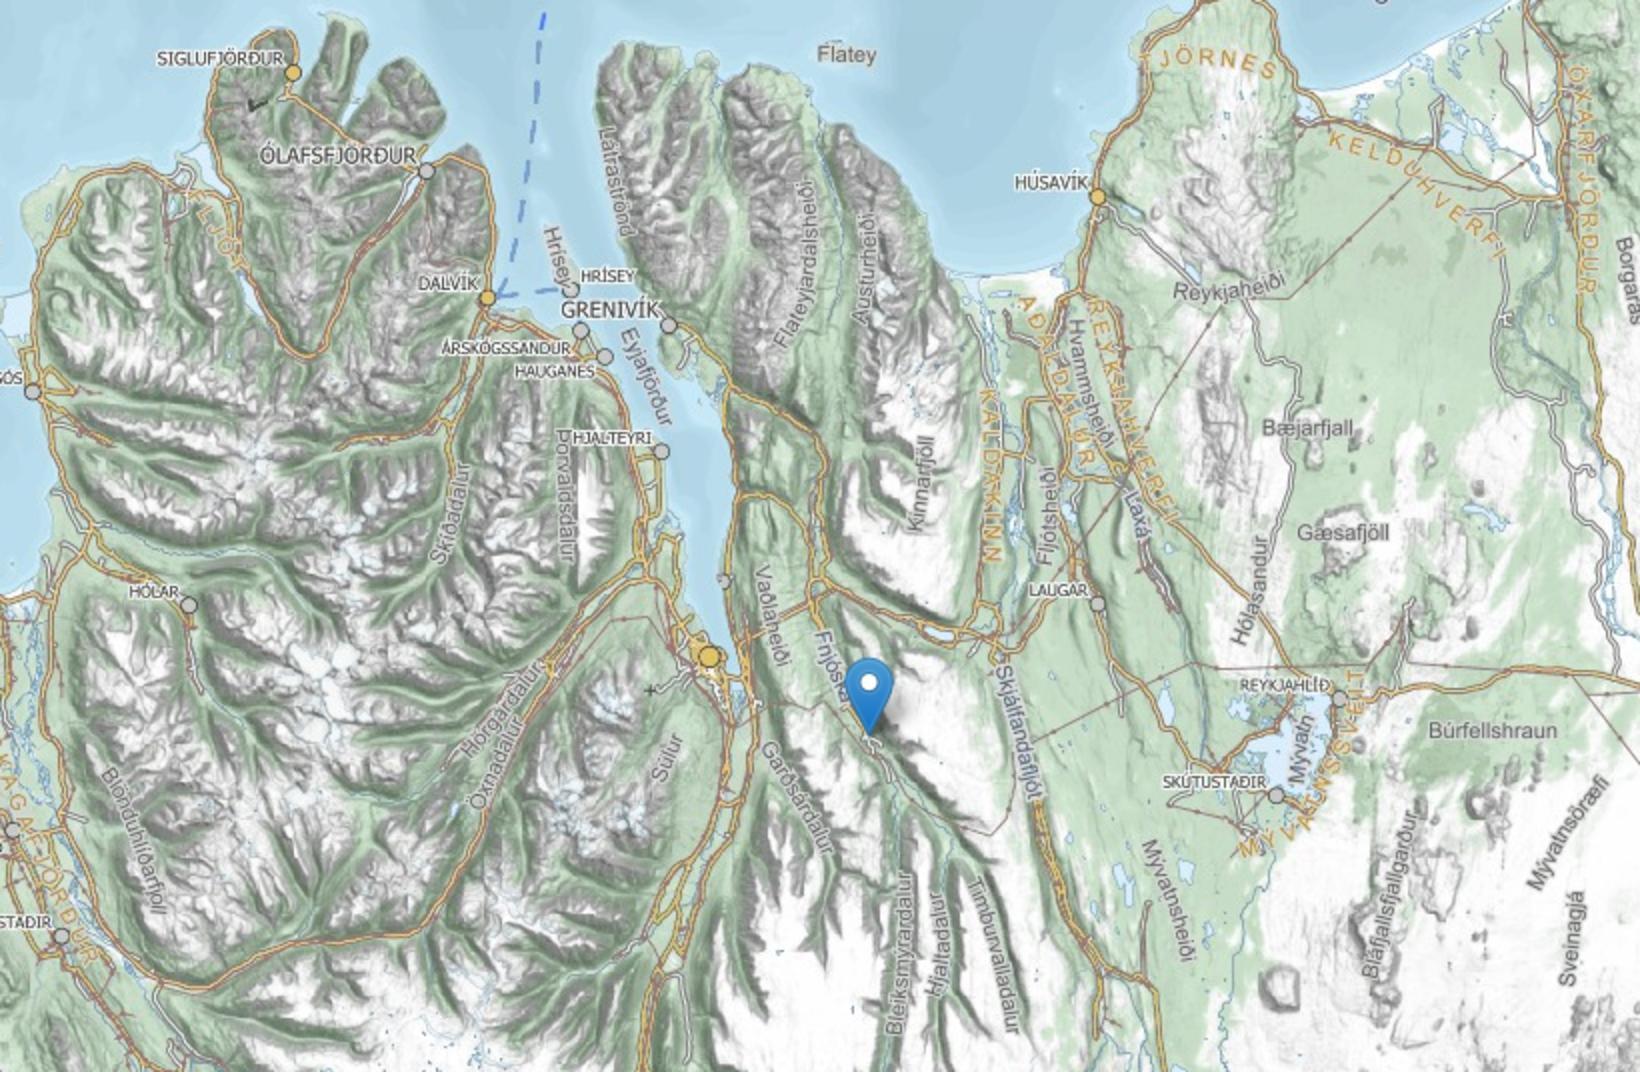 The location of Illugastaðir in Fnjóskadalur valley, North Iceland.